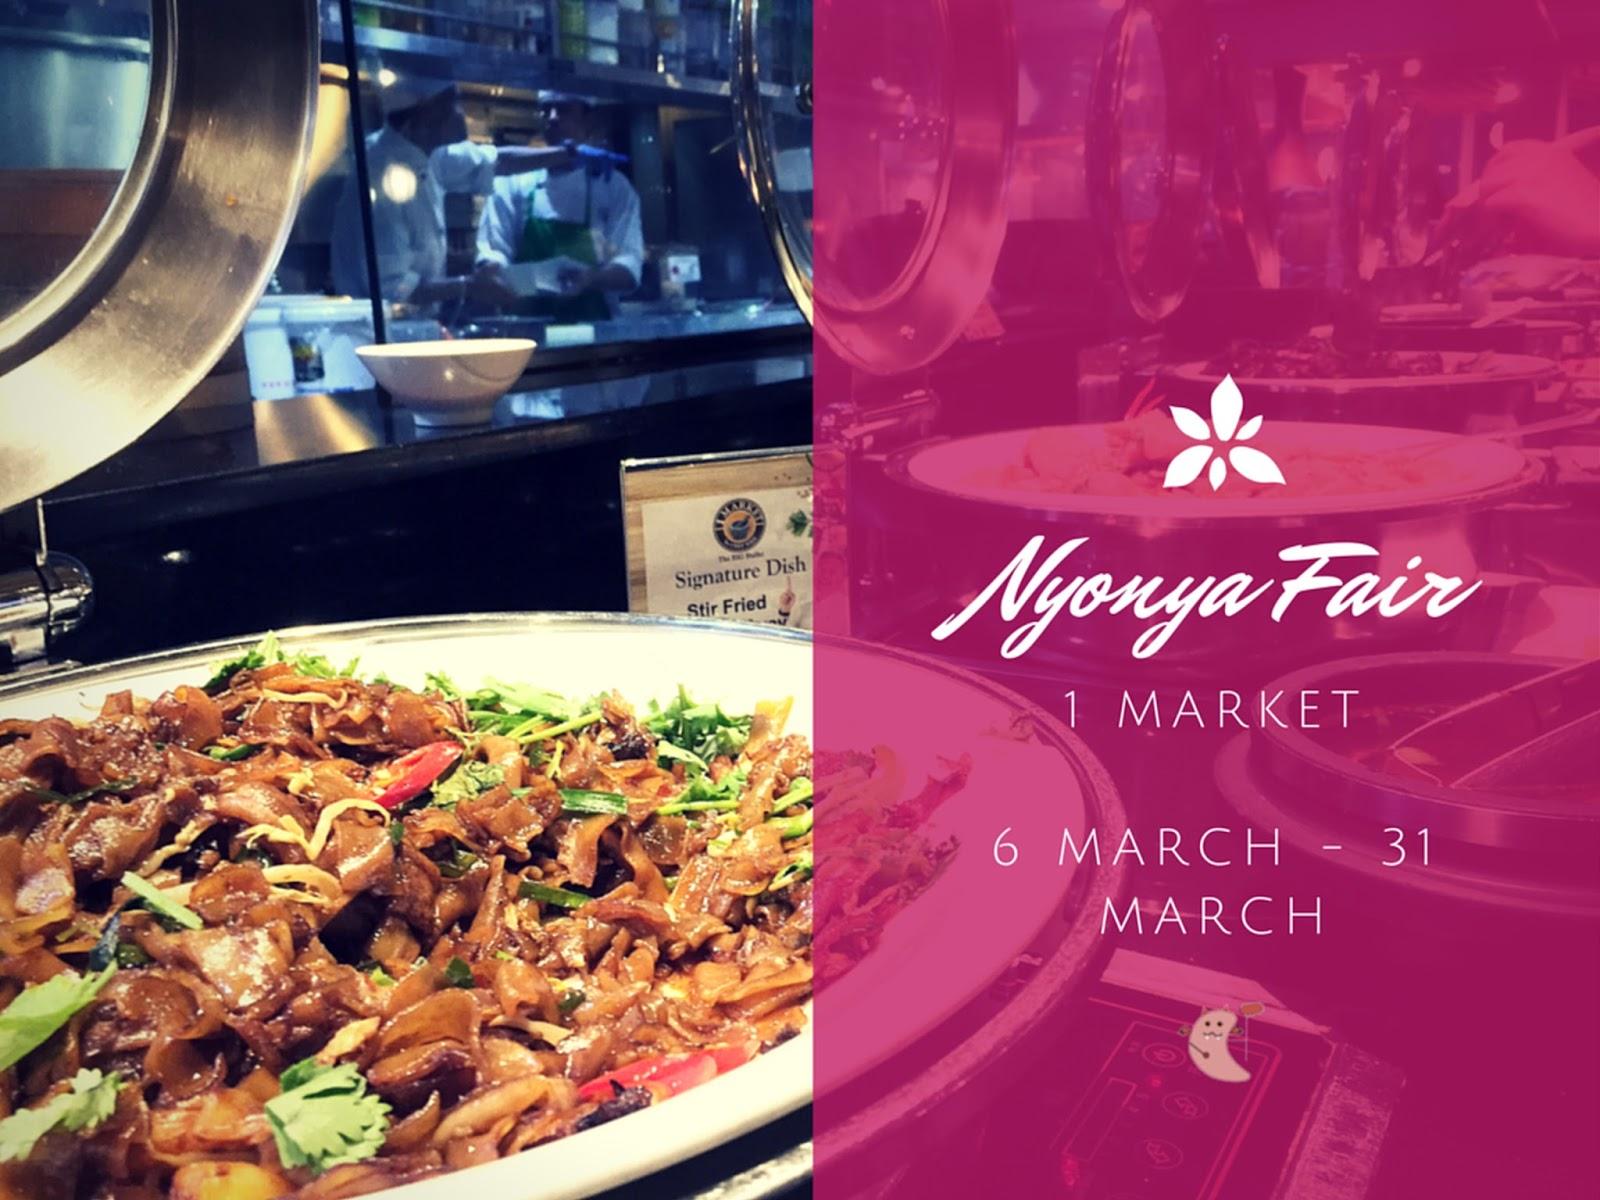 1 Market Nyonya Fair (Plaza Singapura)